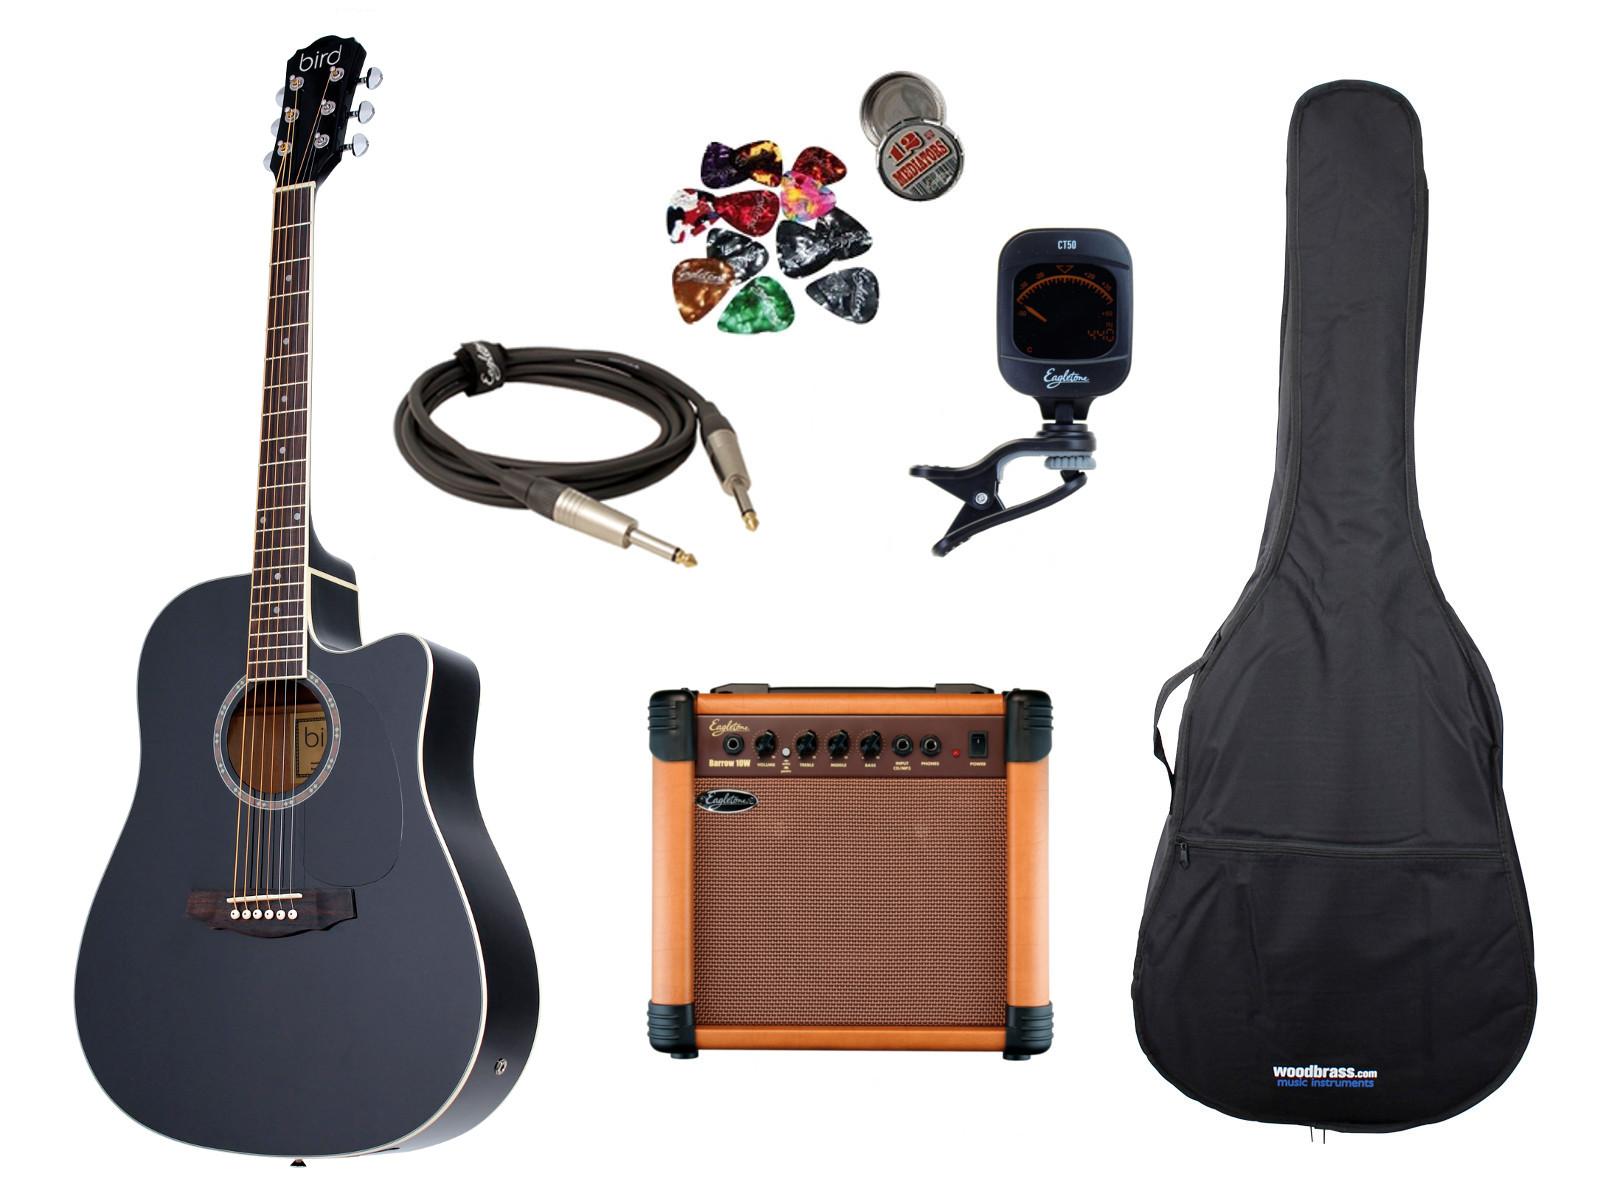 brighton easypack brighton dg1ce nl accessoires guitar. Black Bedroom Furniture Sets. Home Design Ideas